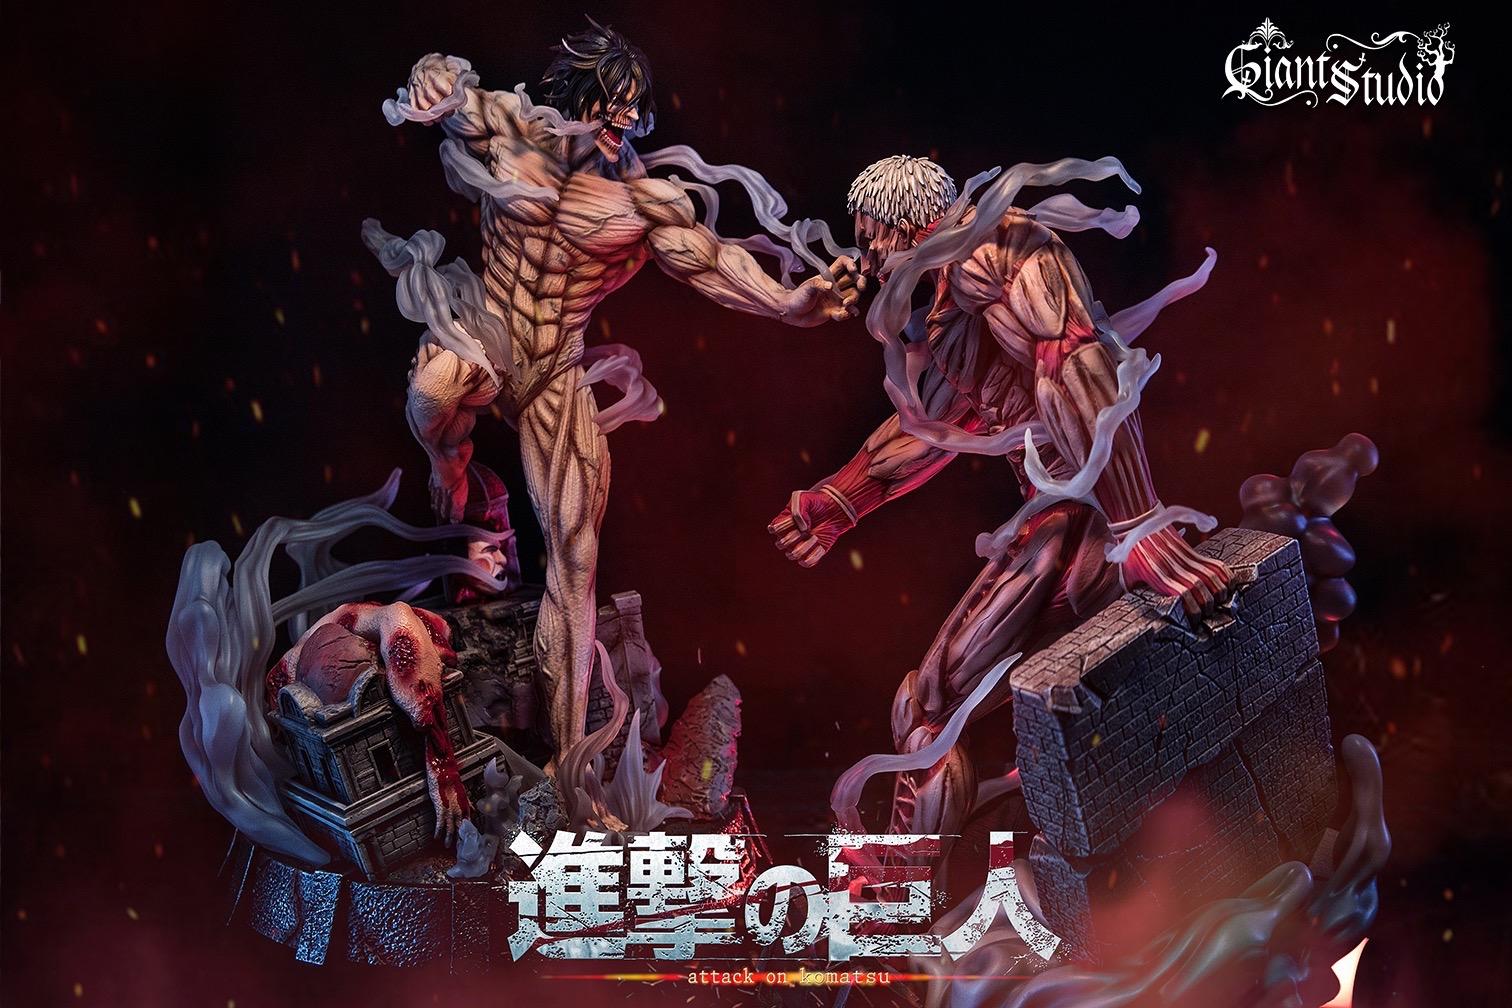 Attack Titan ไททั่นจู่โจม เอเรน by Giant Studio (มัดจำ)